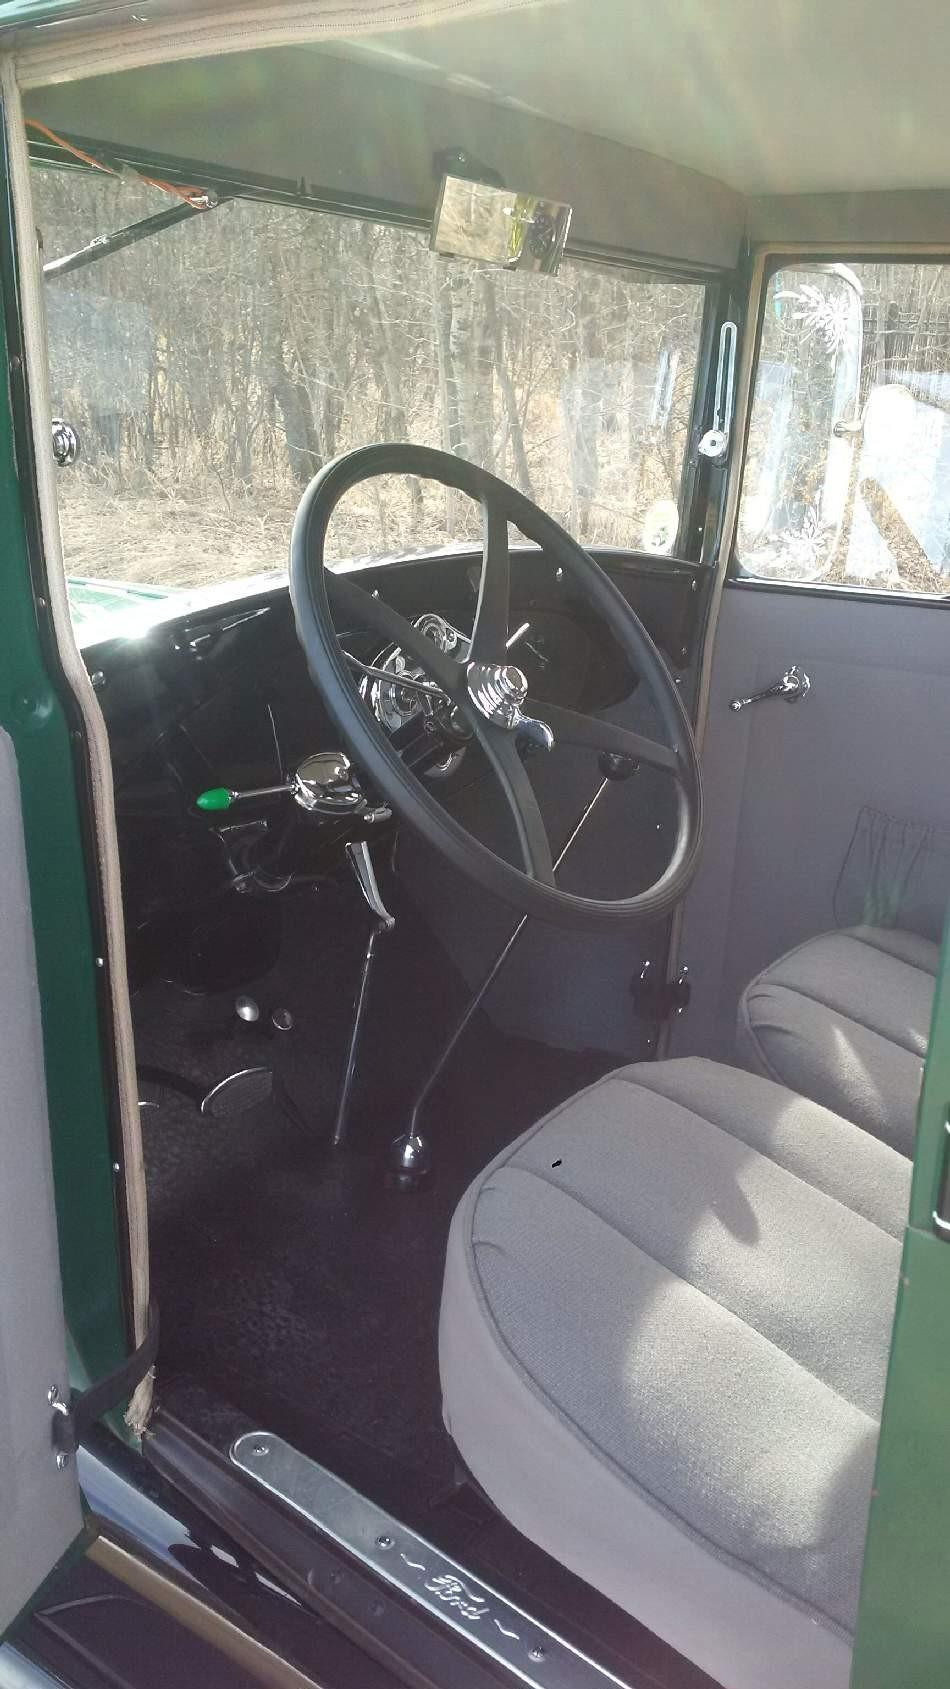 1928 Tudor - Interior Driver's view